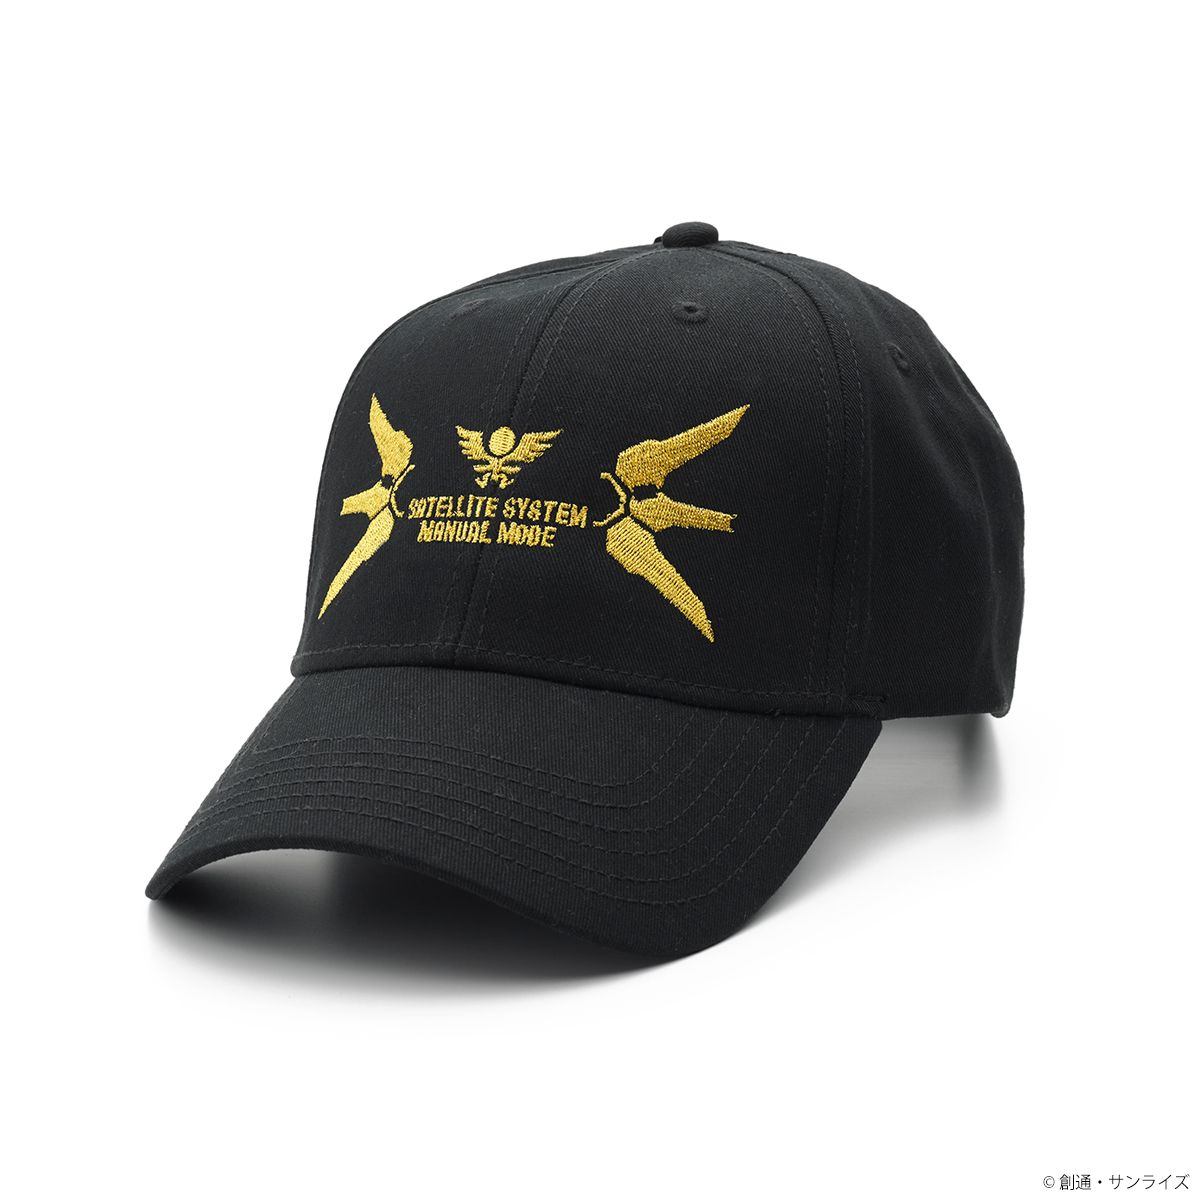 STRICT-G『機動新世紀ガンダムX』cap 新地球連邦